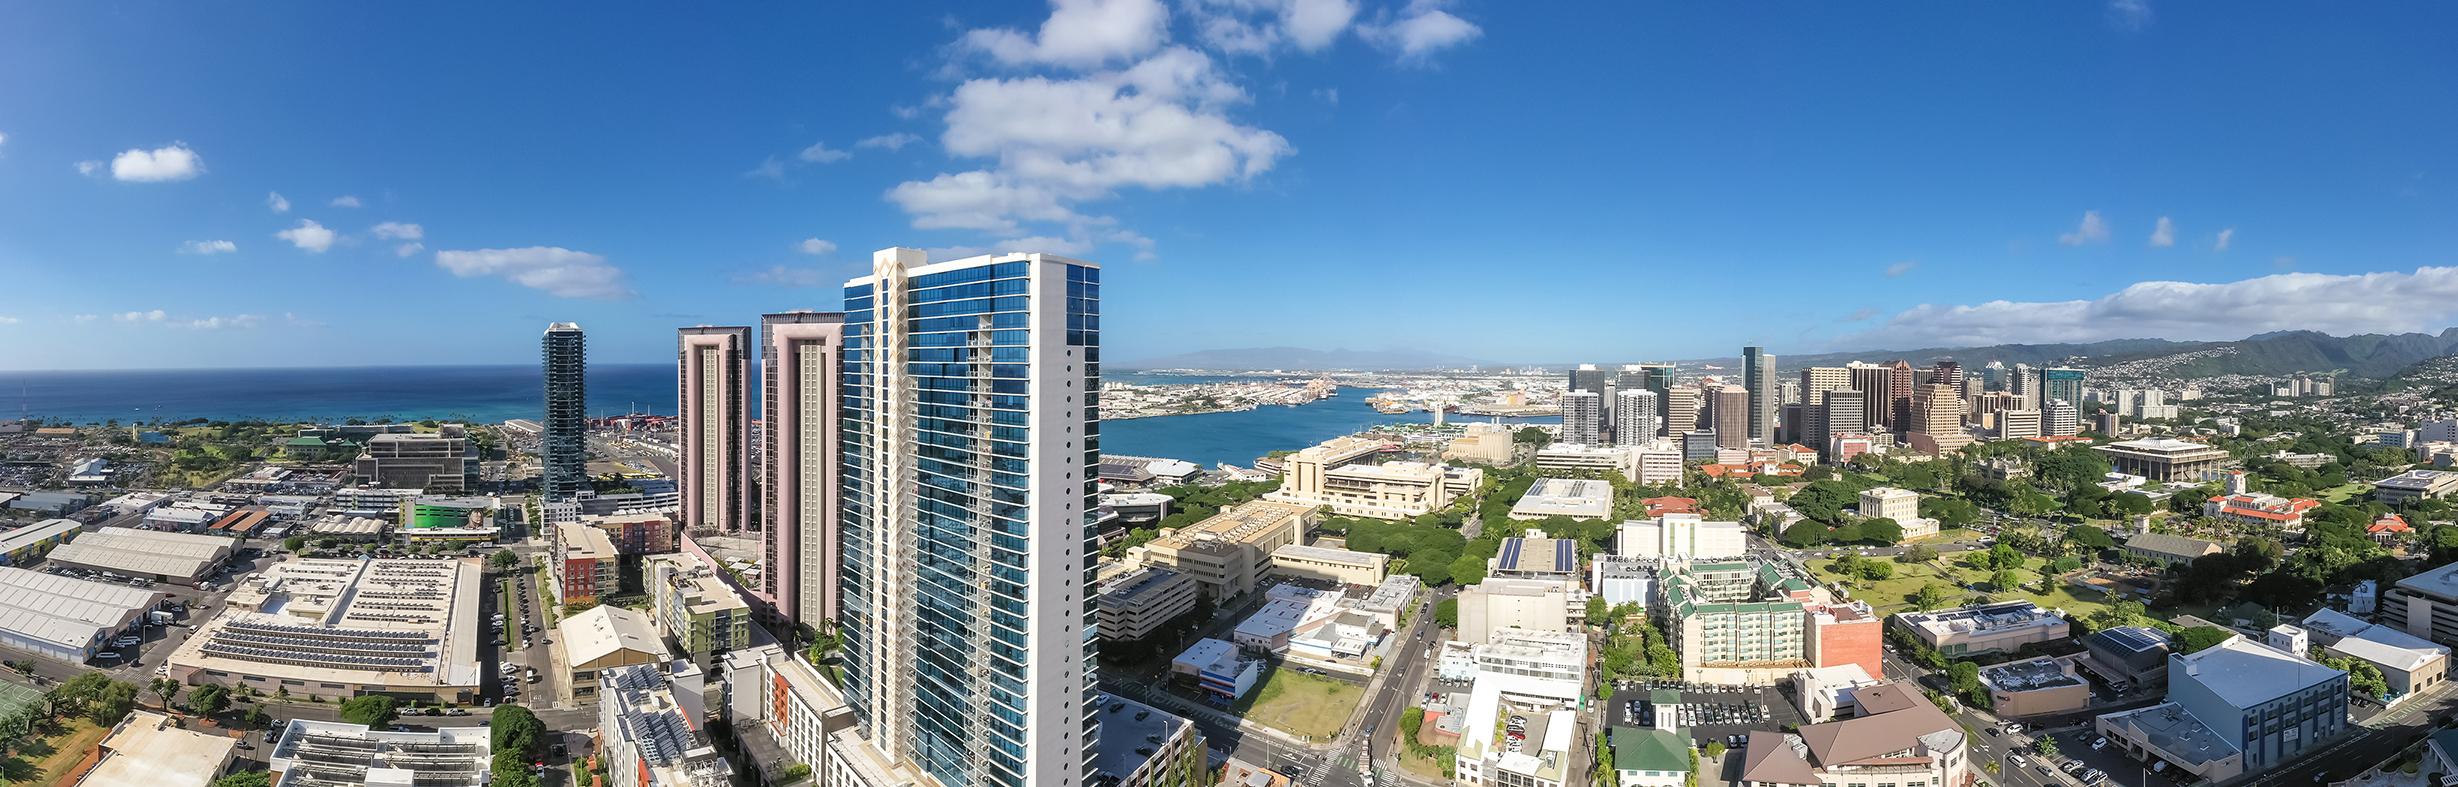 Ililani Ocean/Ewa View 38th Floor